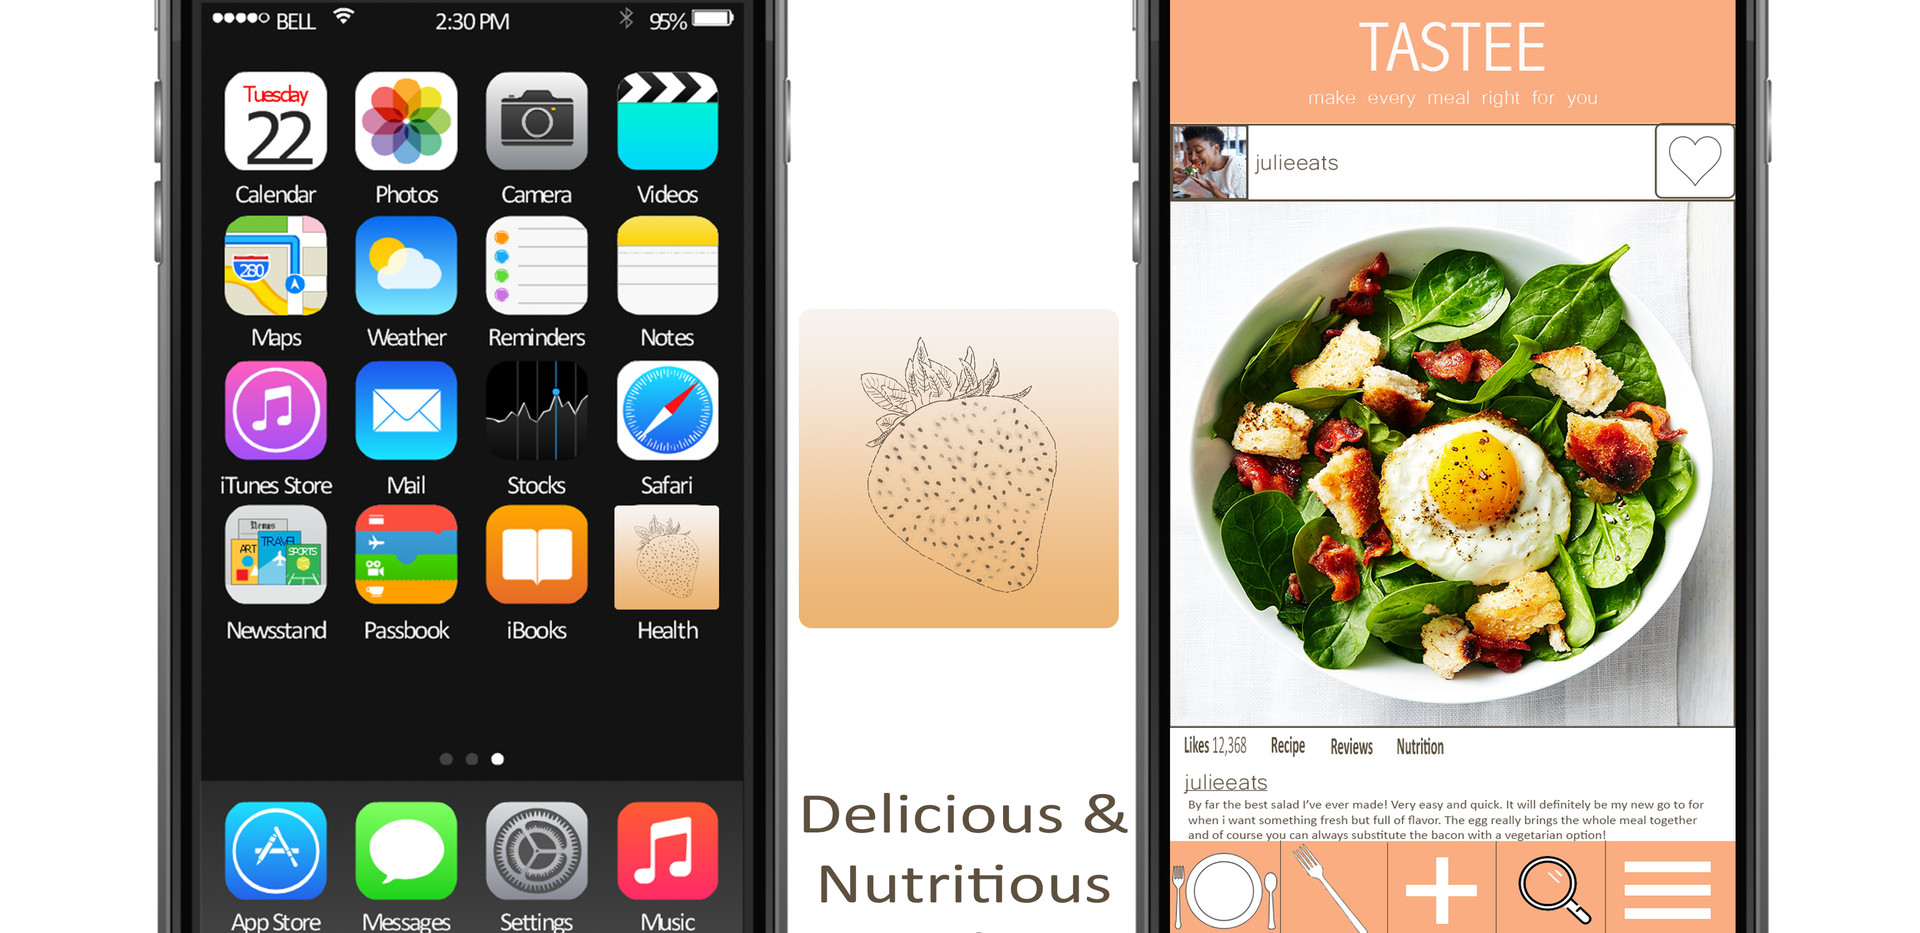 TASTEE App design